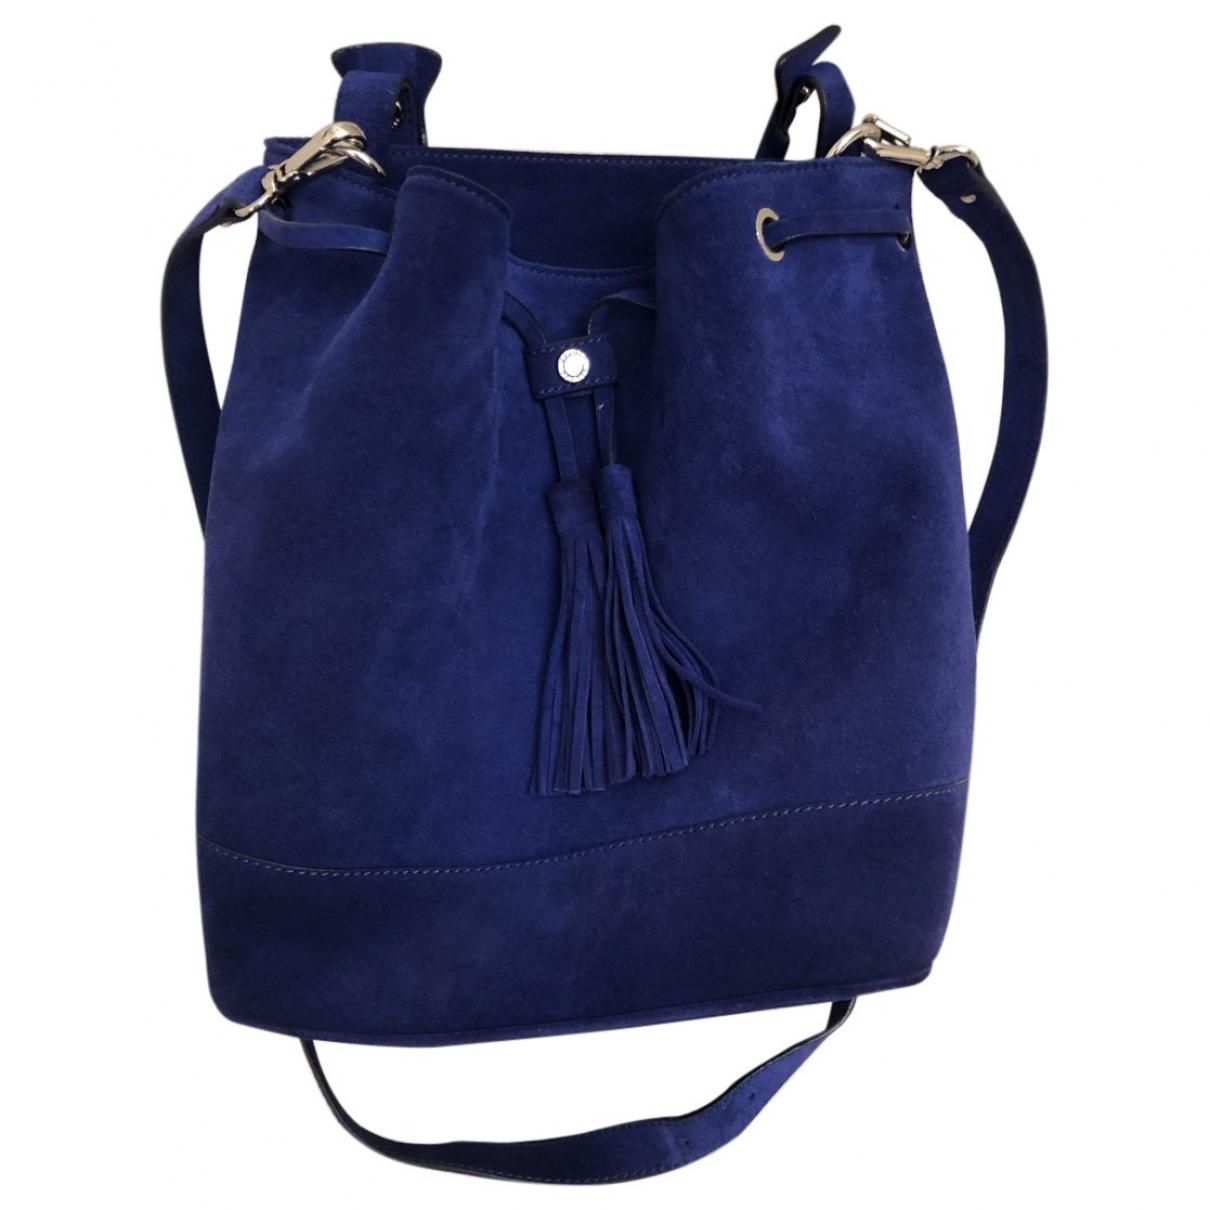 Sandro \N Blue Suede handbag for Women \N